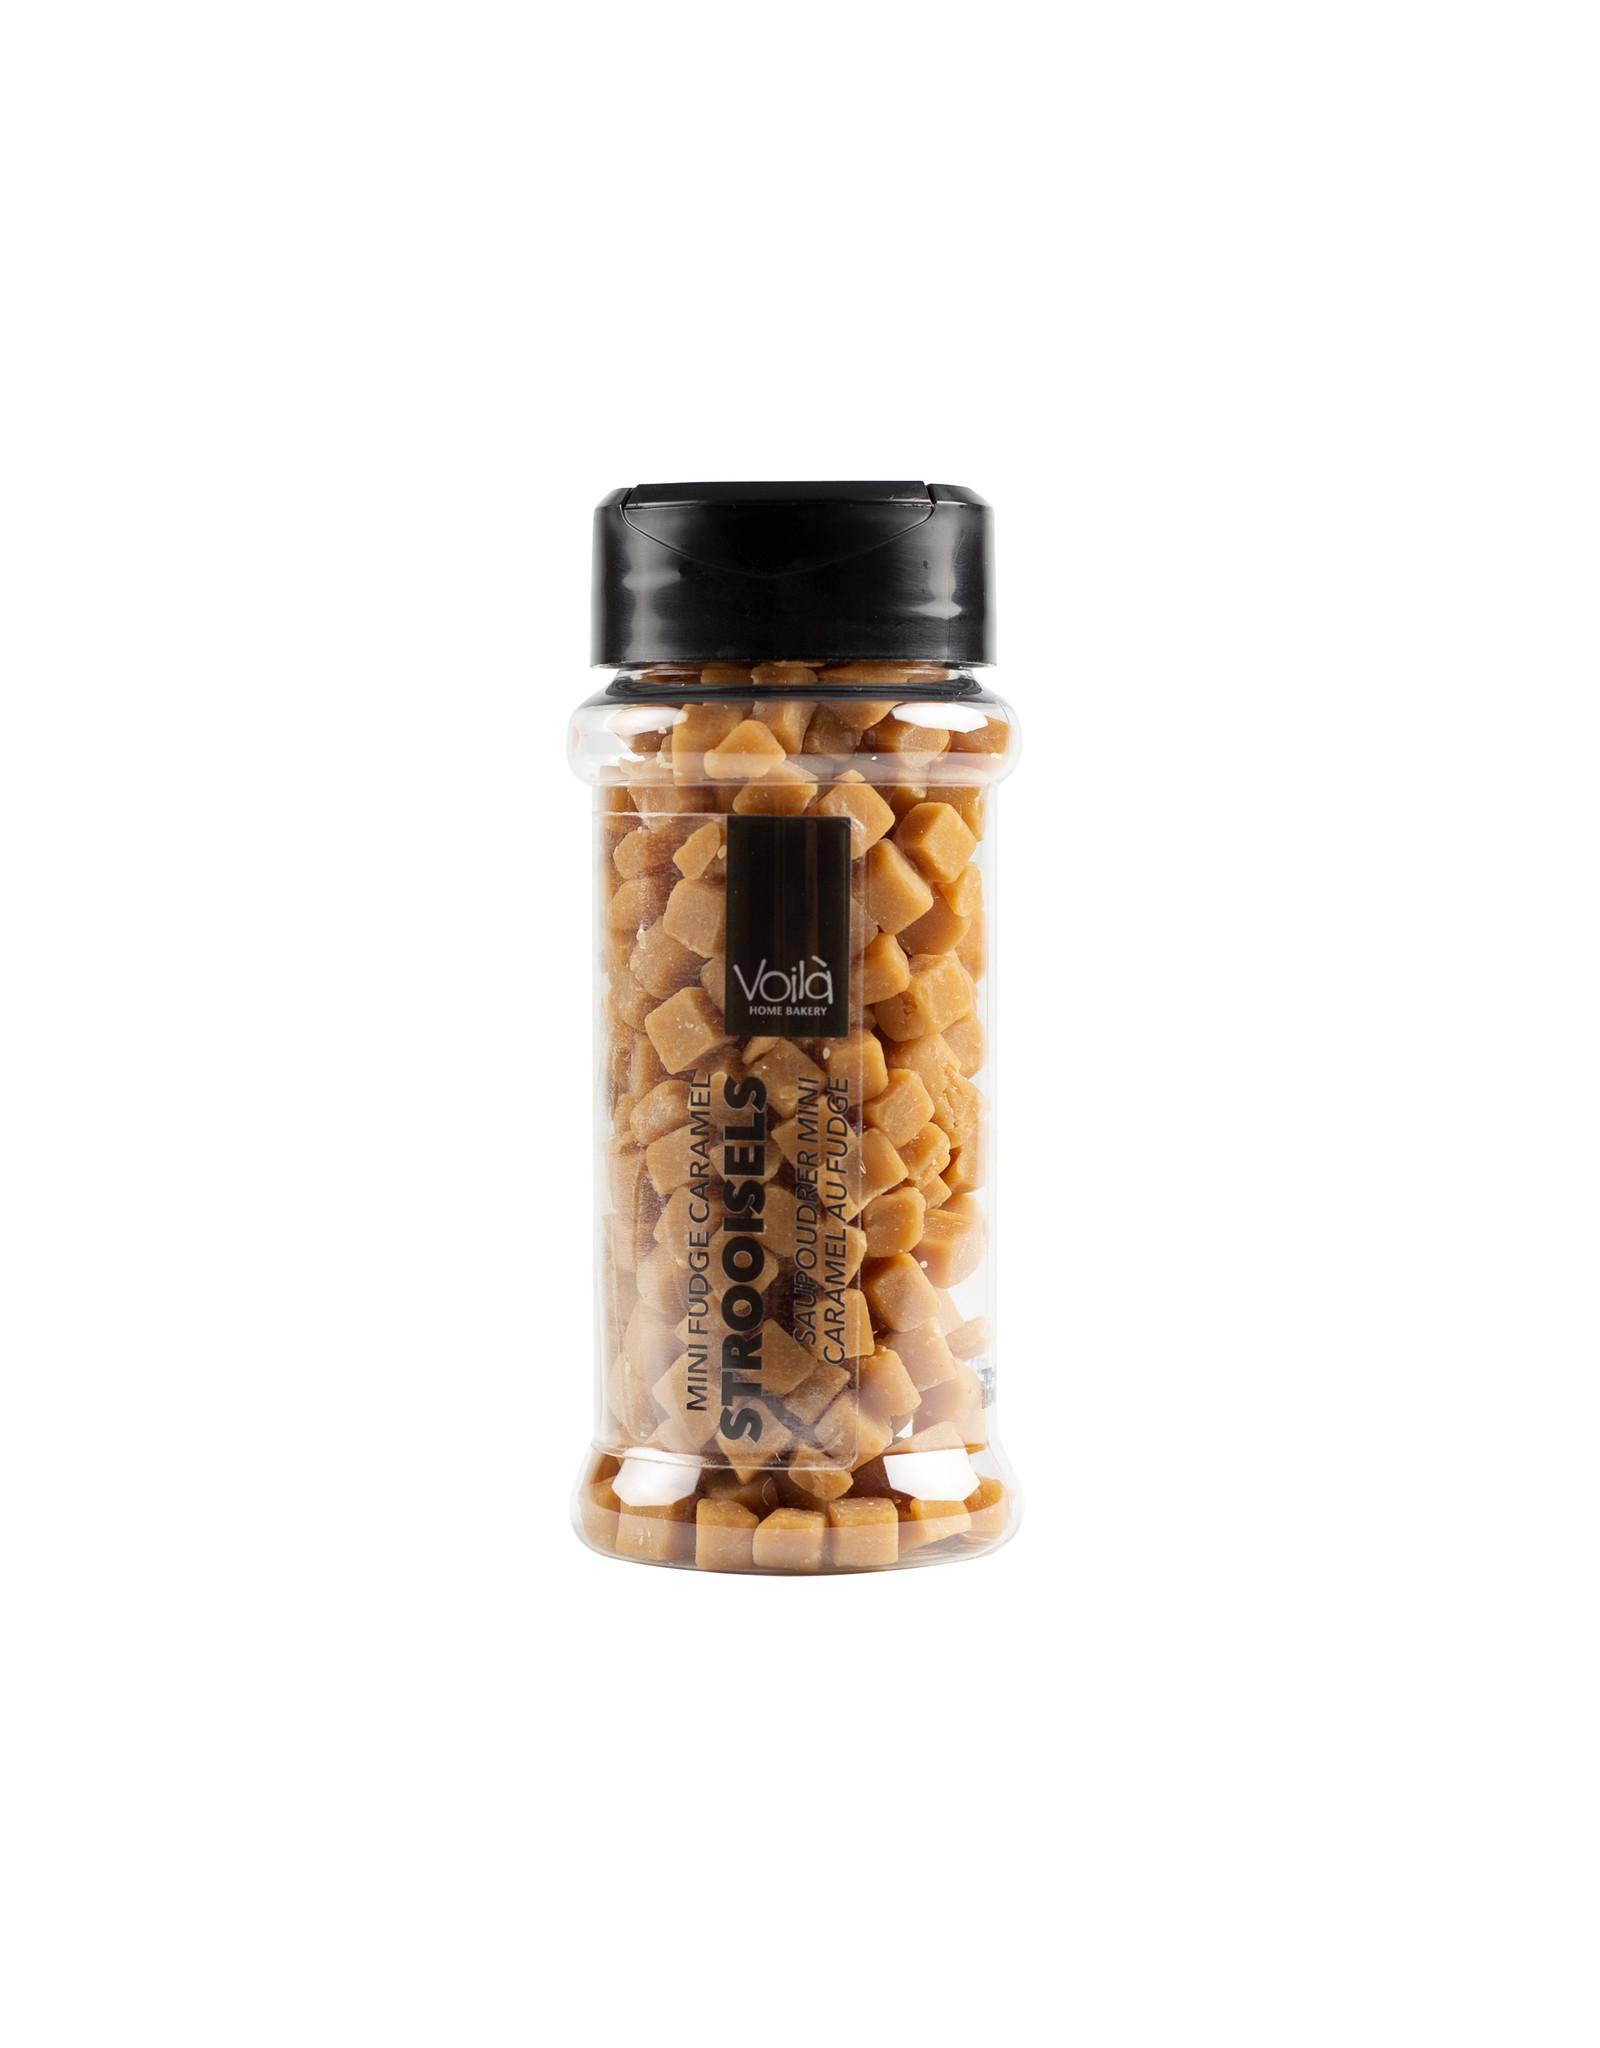 VOILA Home Bakery Voila Home Bakery Mini Pastilles Caramel - 12x 70 grammes emballage pratique - carton principal